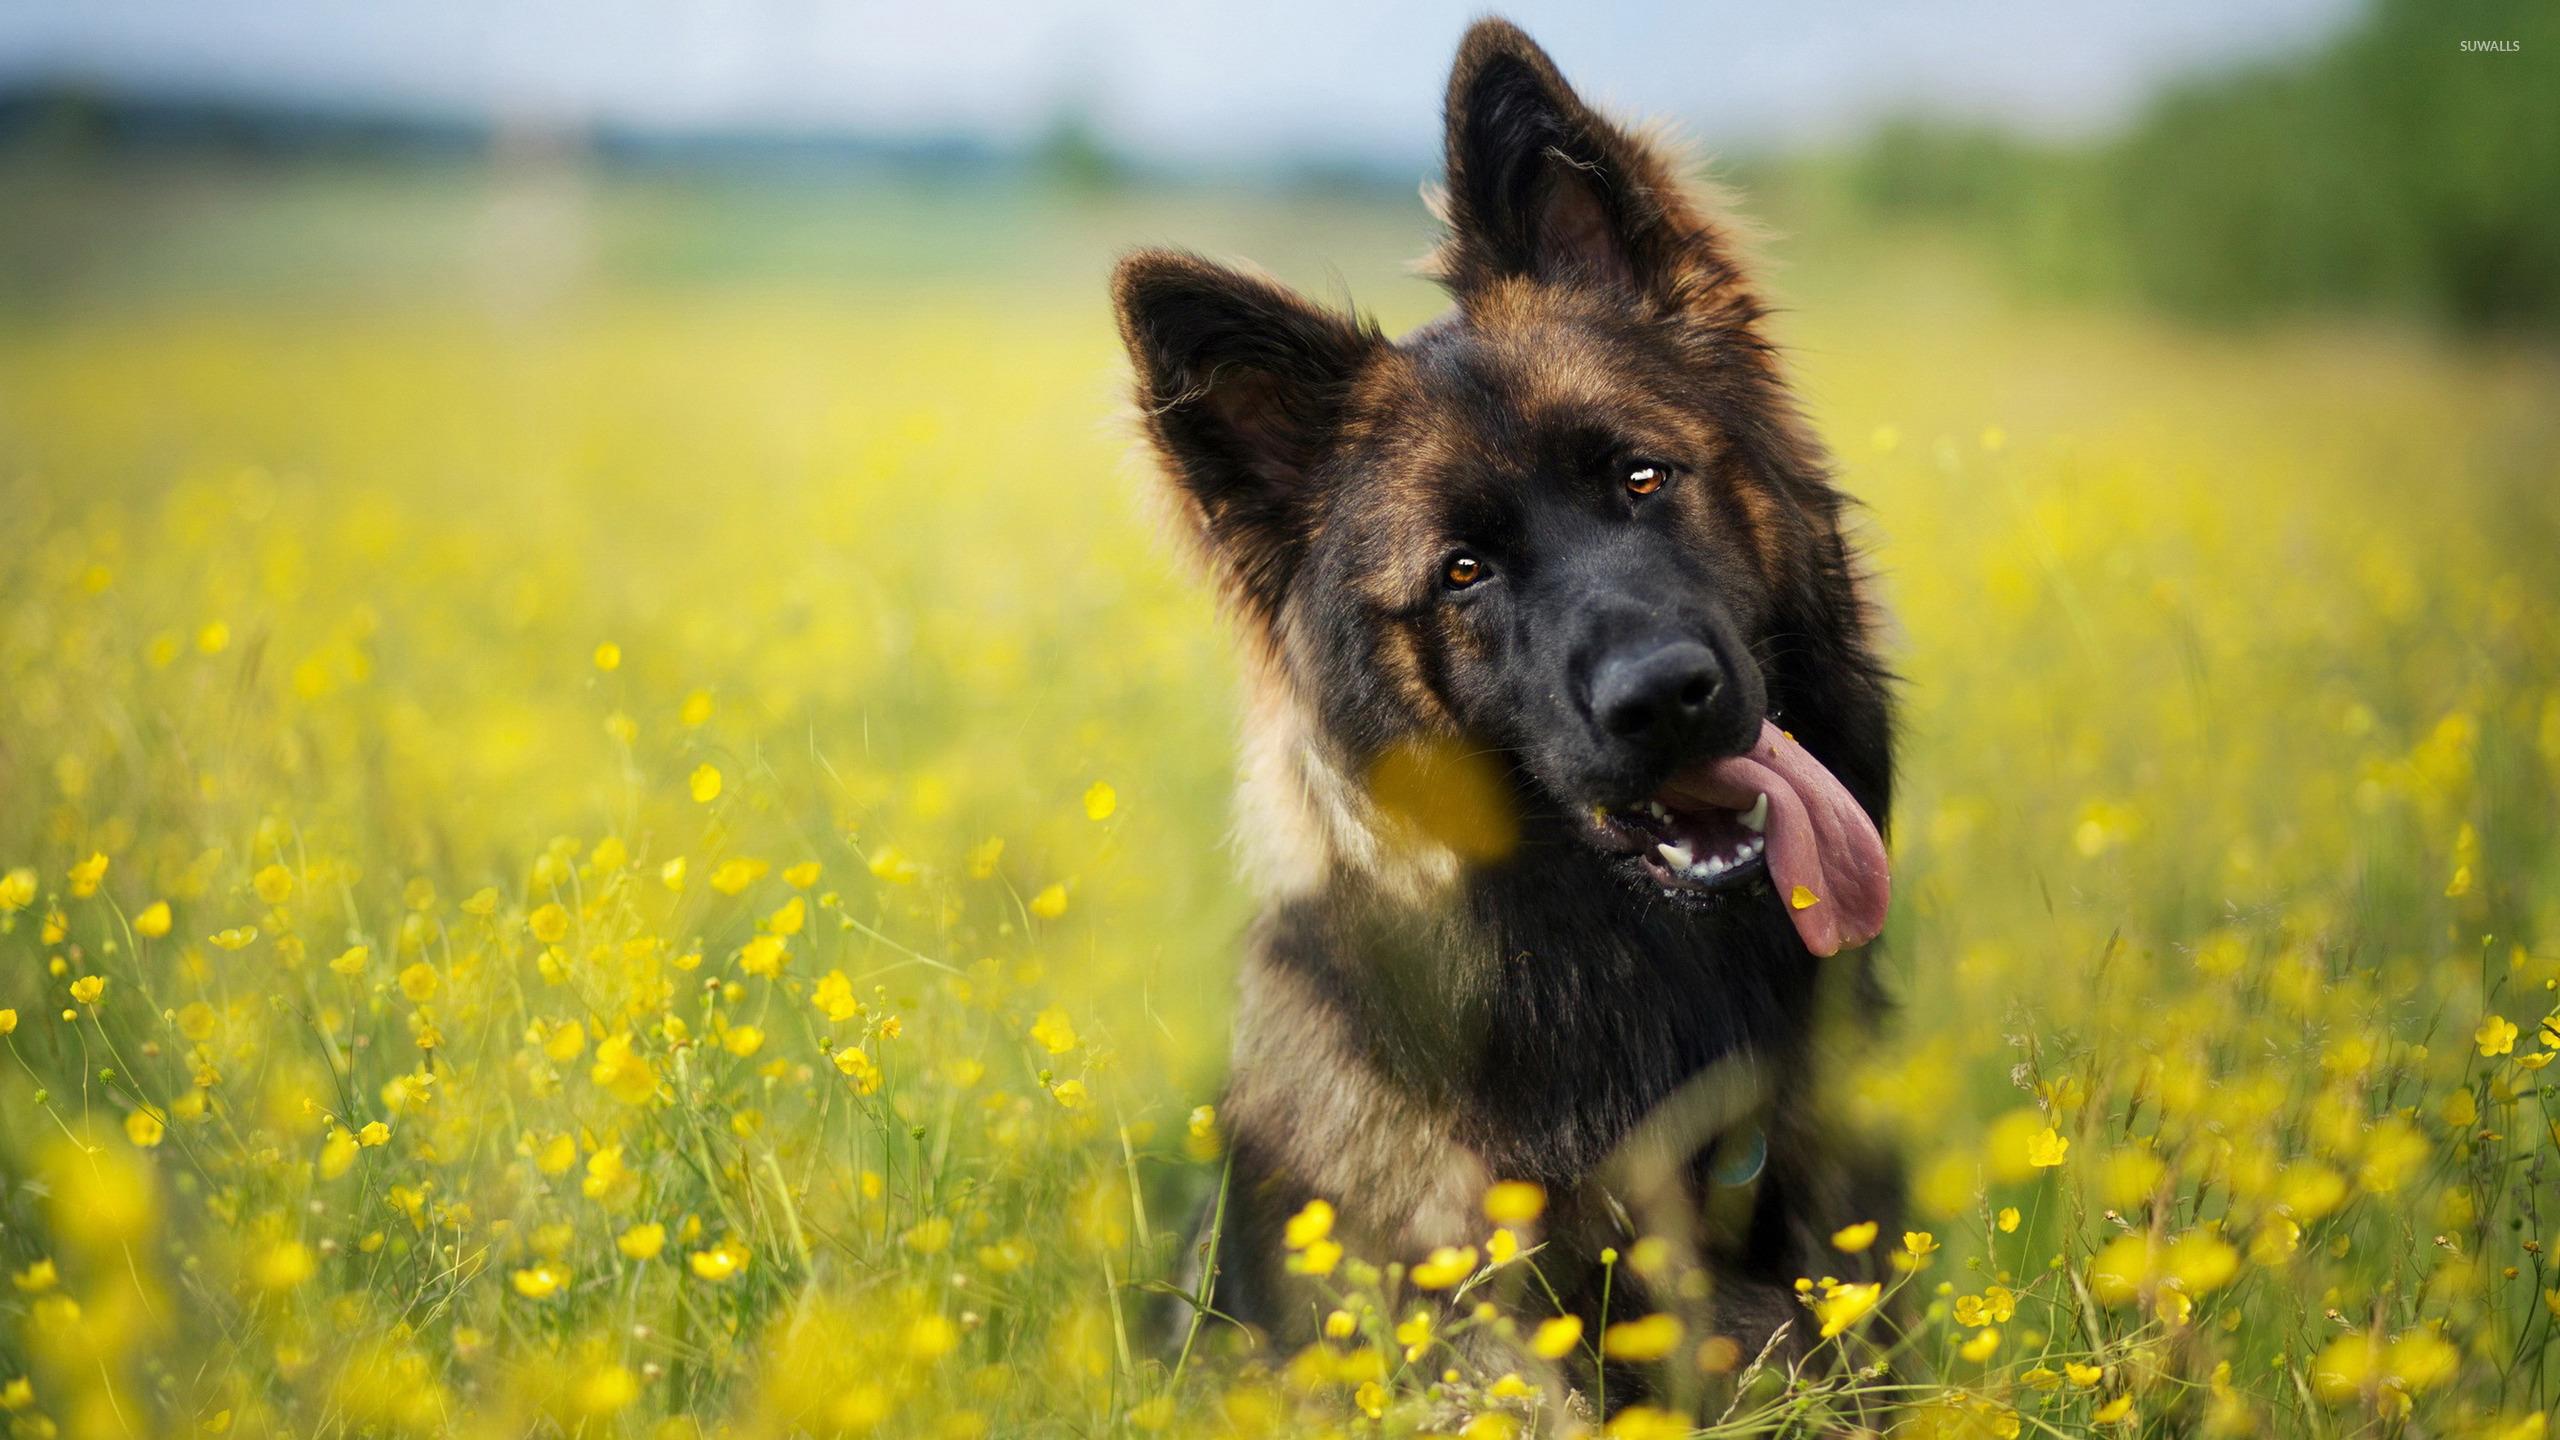 Cute Puppies Wallpaper Backgrounds German Shepherd 4 Wallpaper Animal Wallpapers 39517